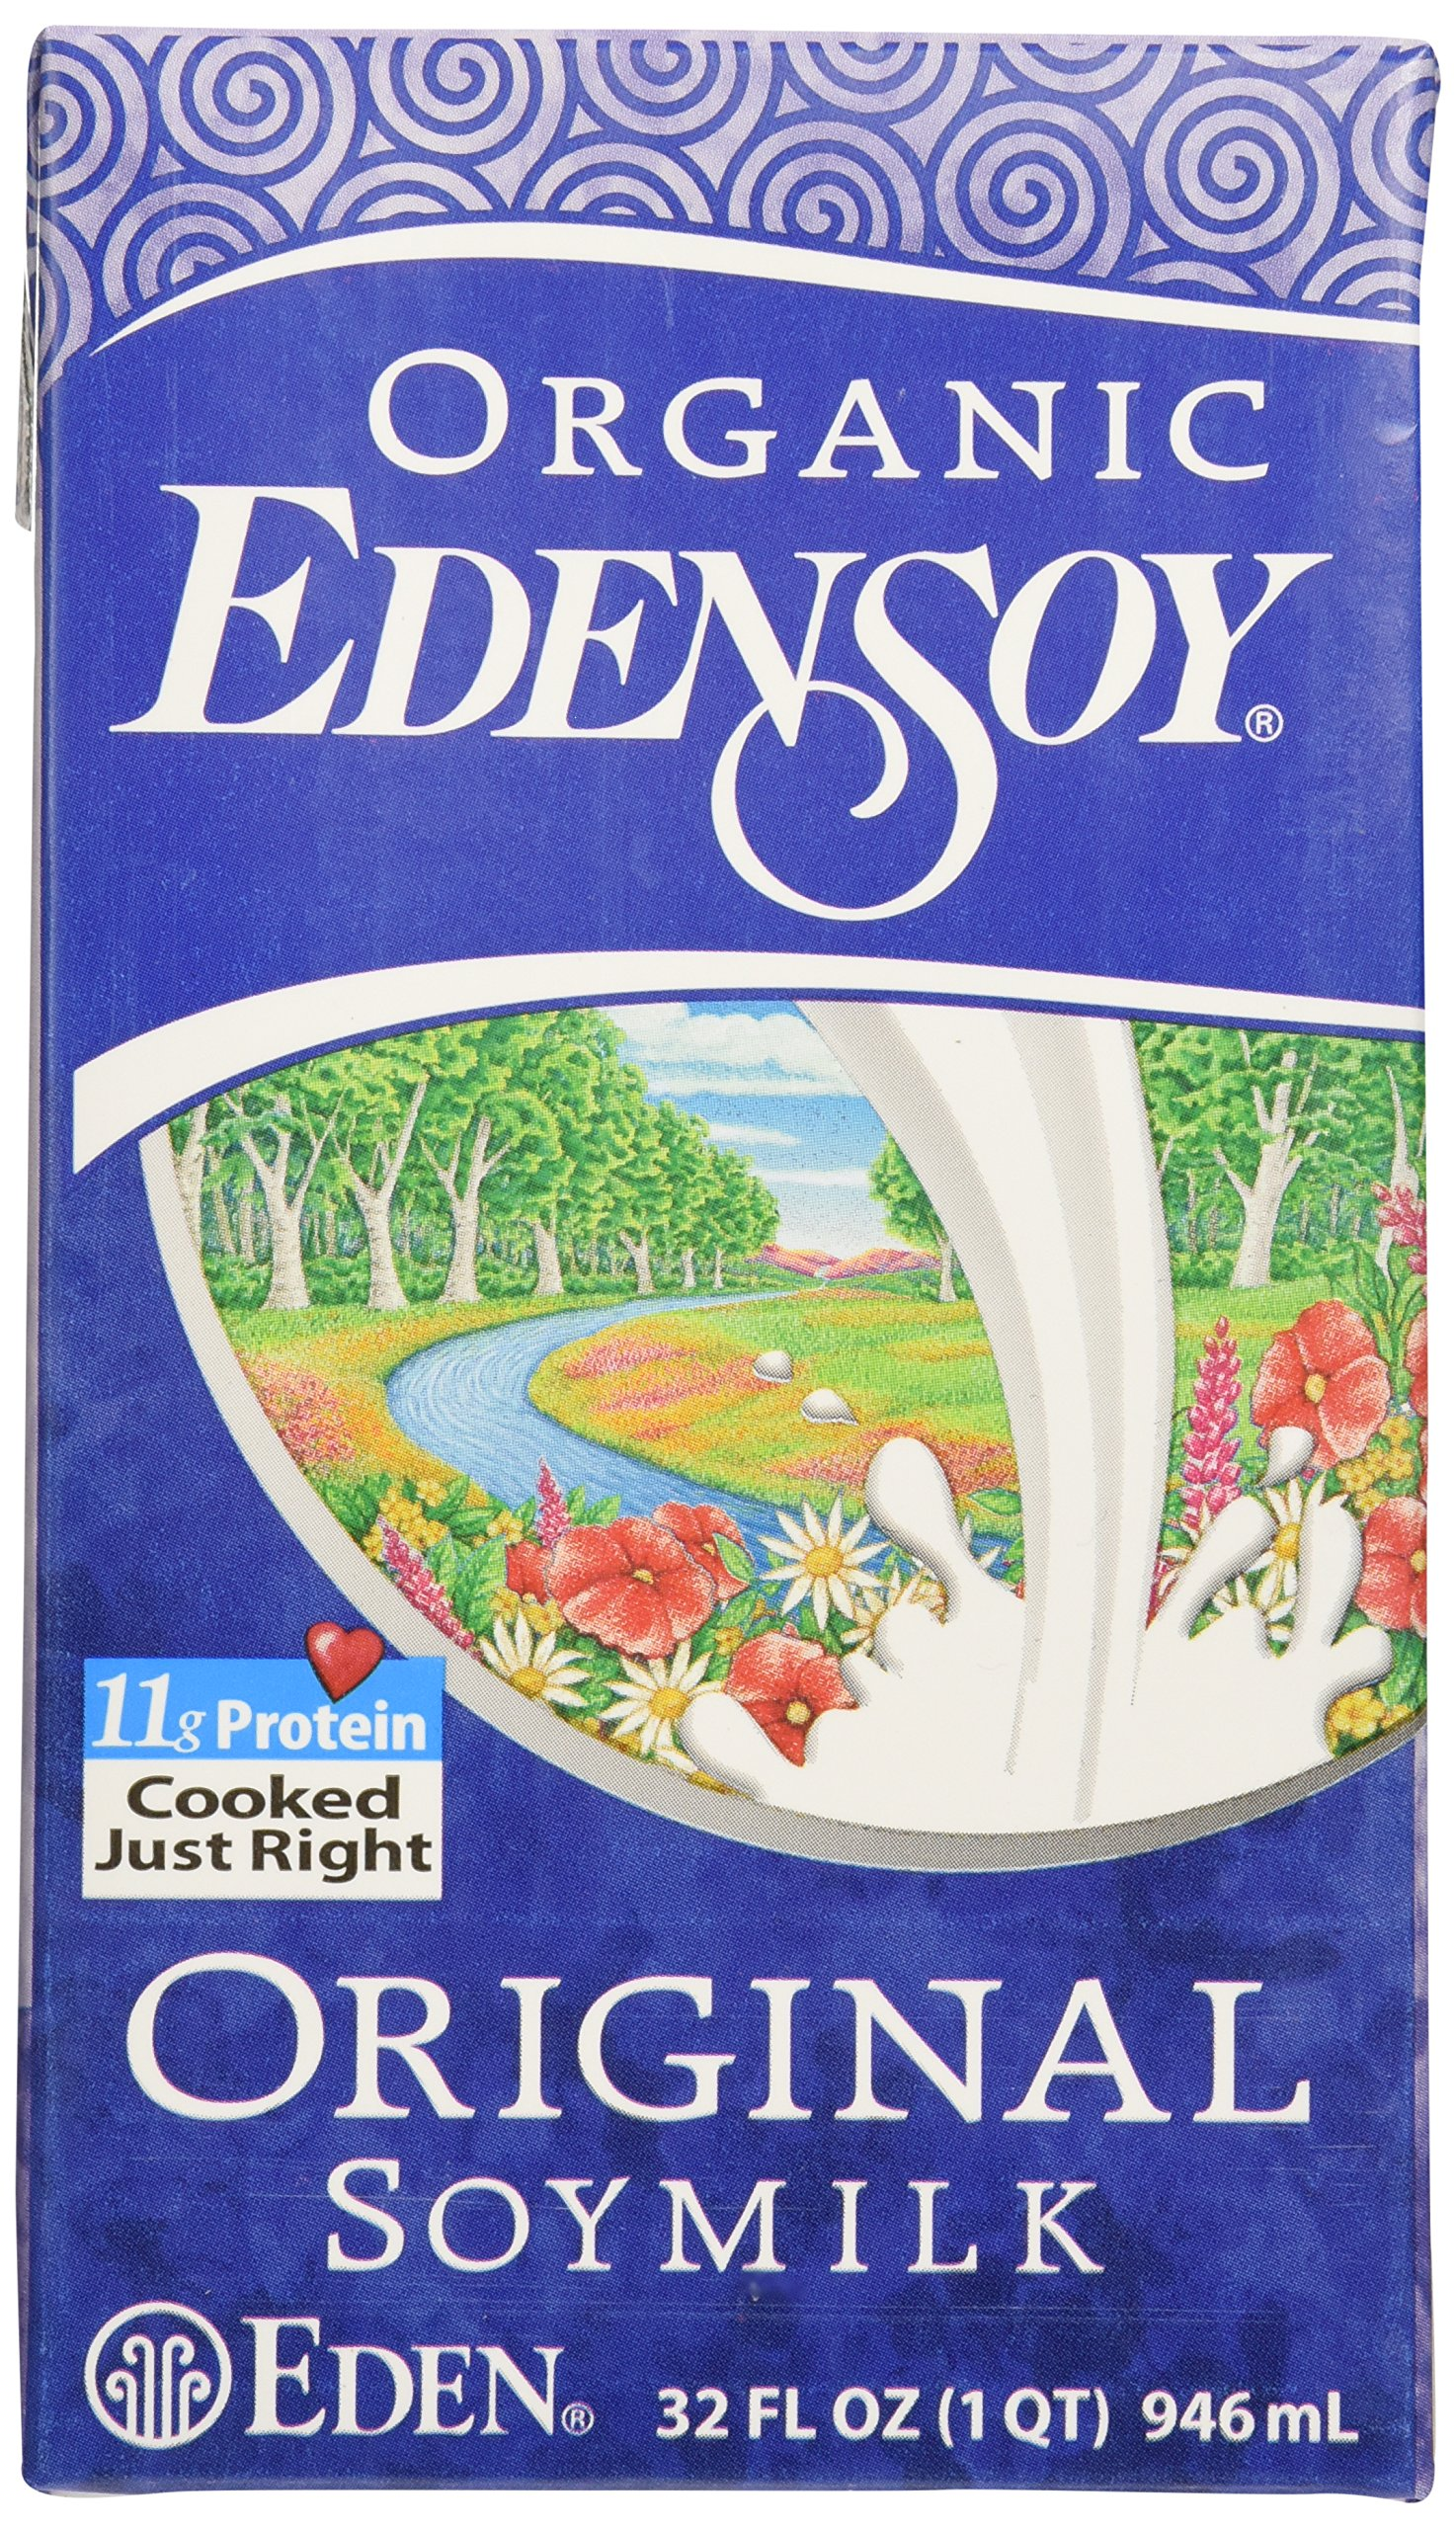 Eden Foods, Soy Milk Original Organic, 32 Fl Oz by Eden (Image #1)